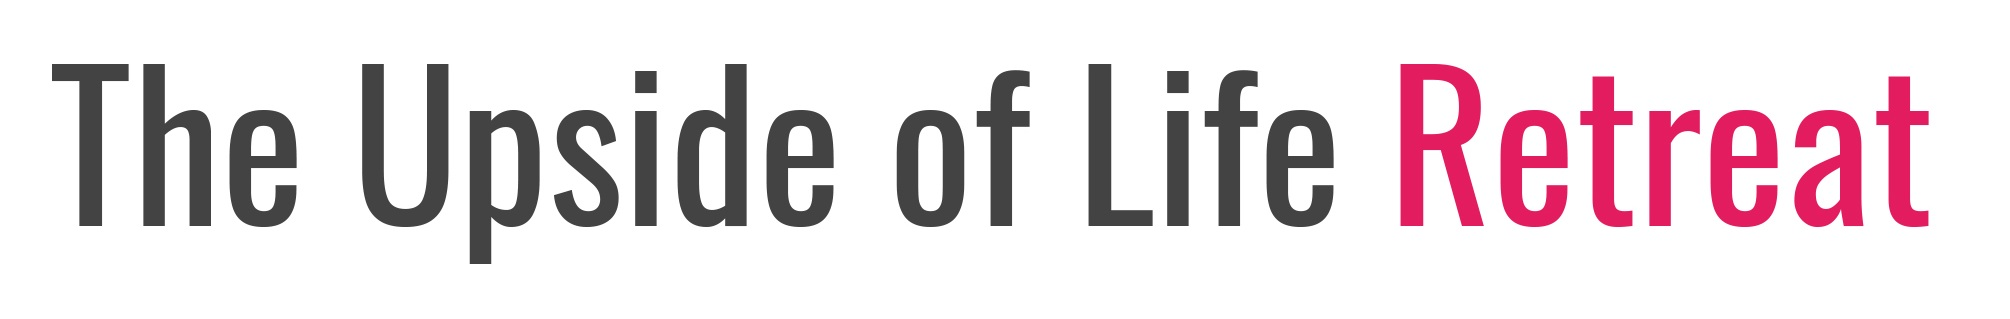 Upside+of+Life+Retreat+Header.jpg